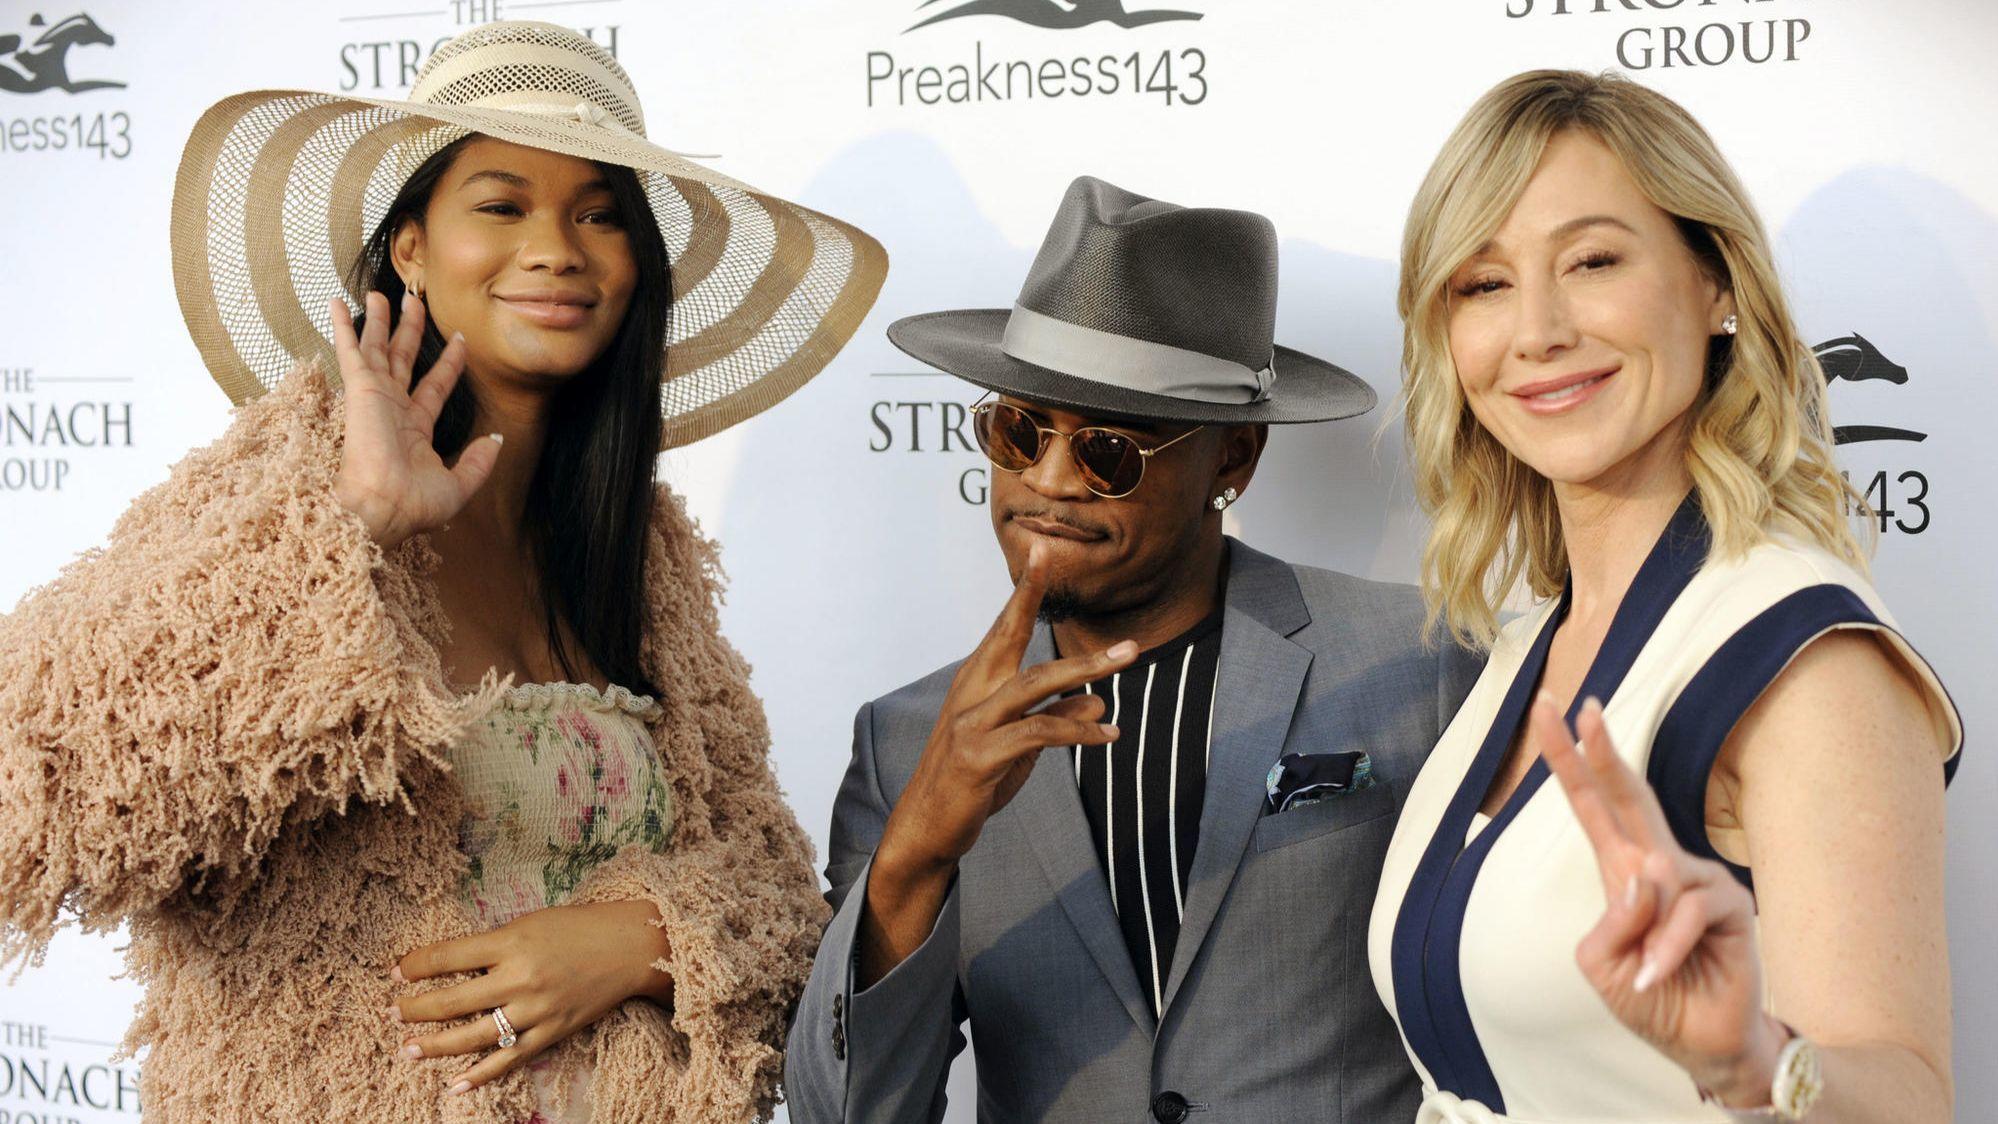 Ne Yo Chanel Iman Among Celebrities Spotted At Preakness